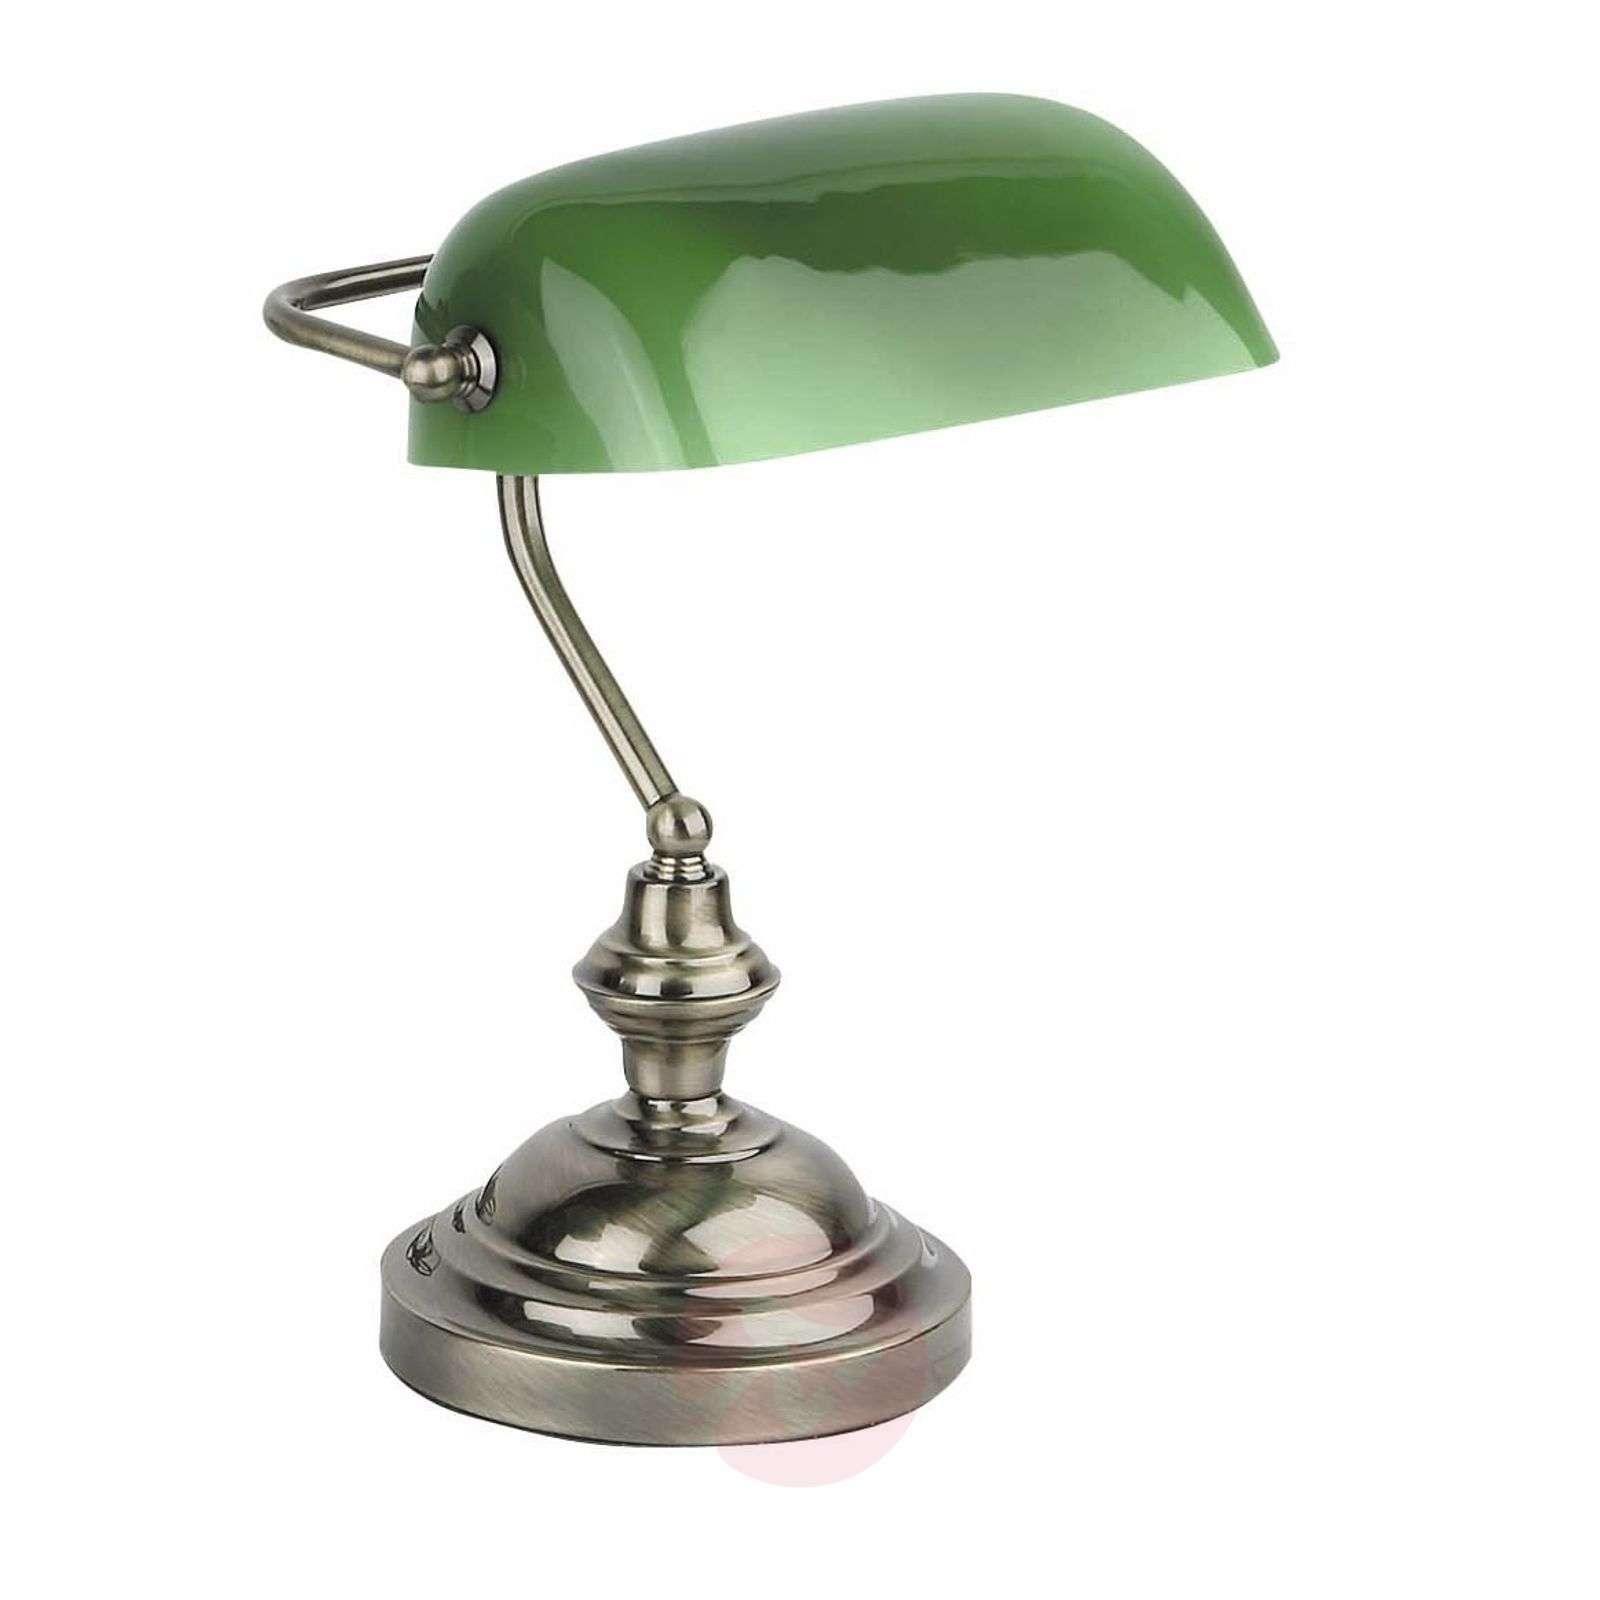 Charming BANKER Table Light, Old Gold-3506864-01